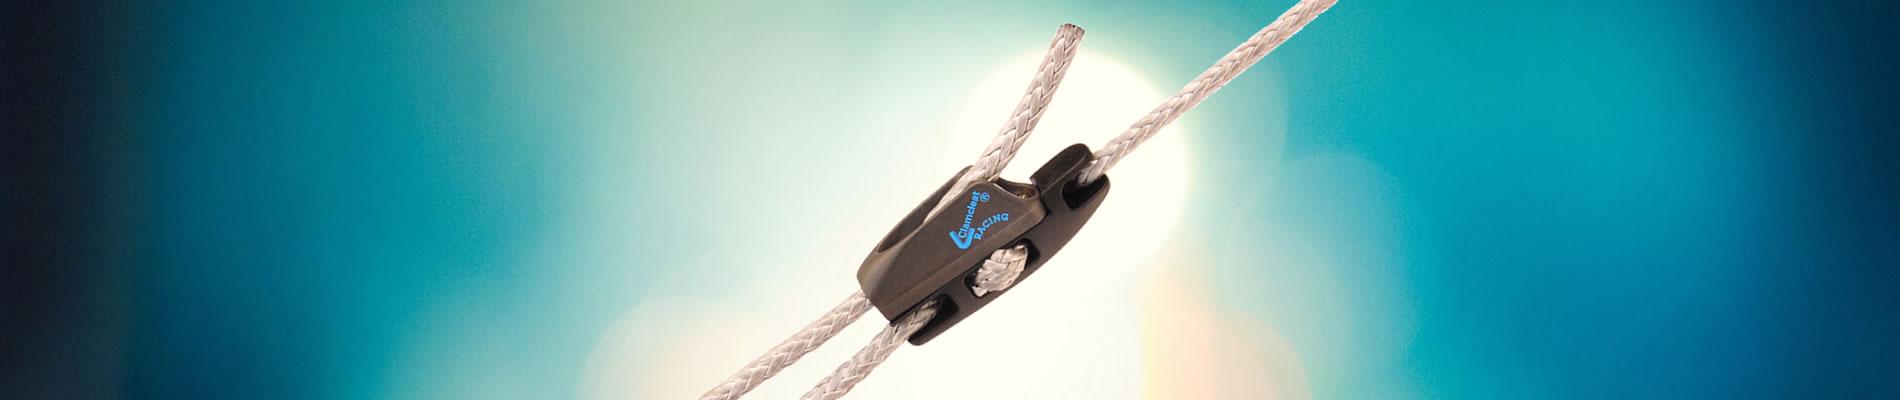 ClamCleat per Kitesurfing